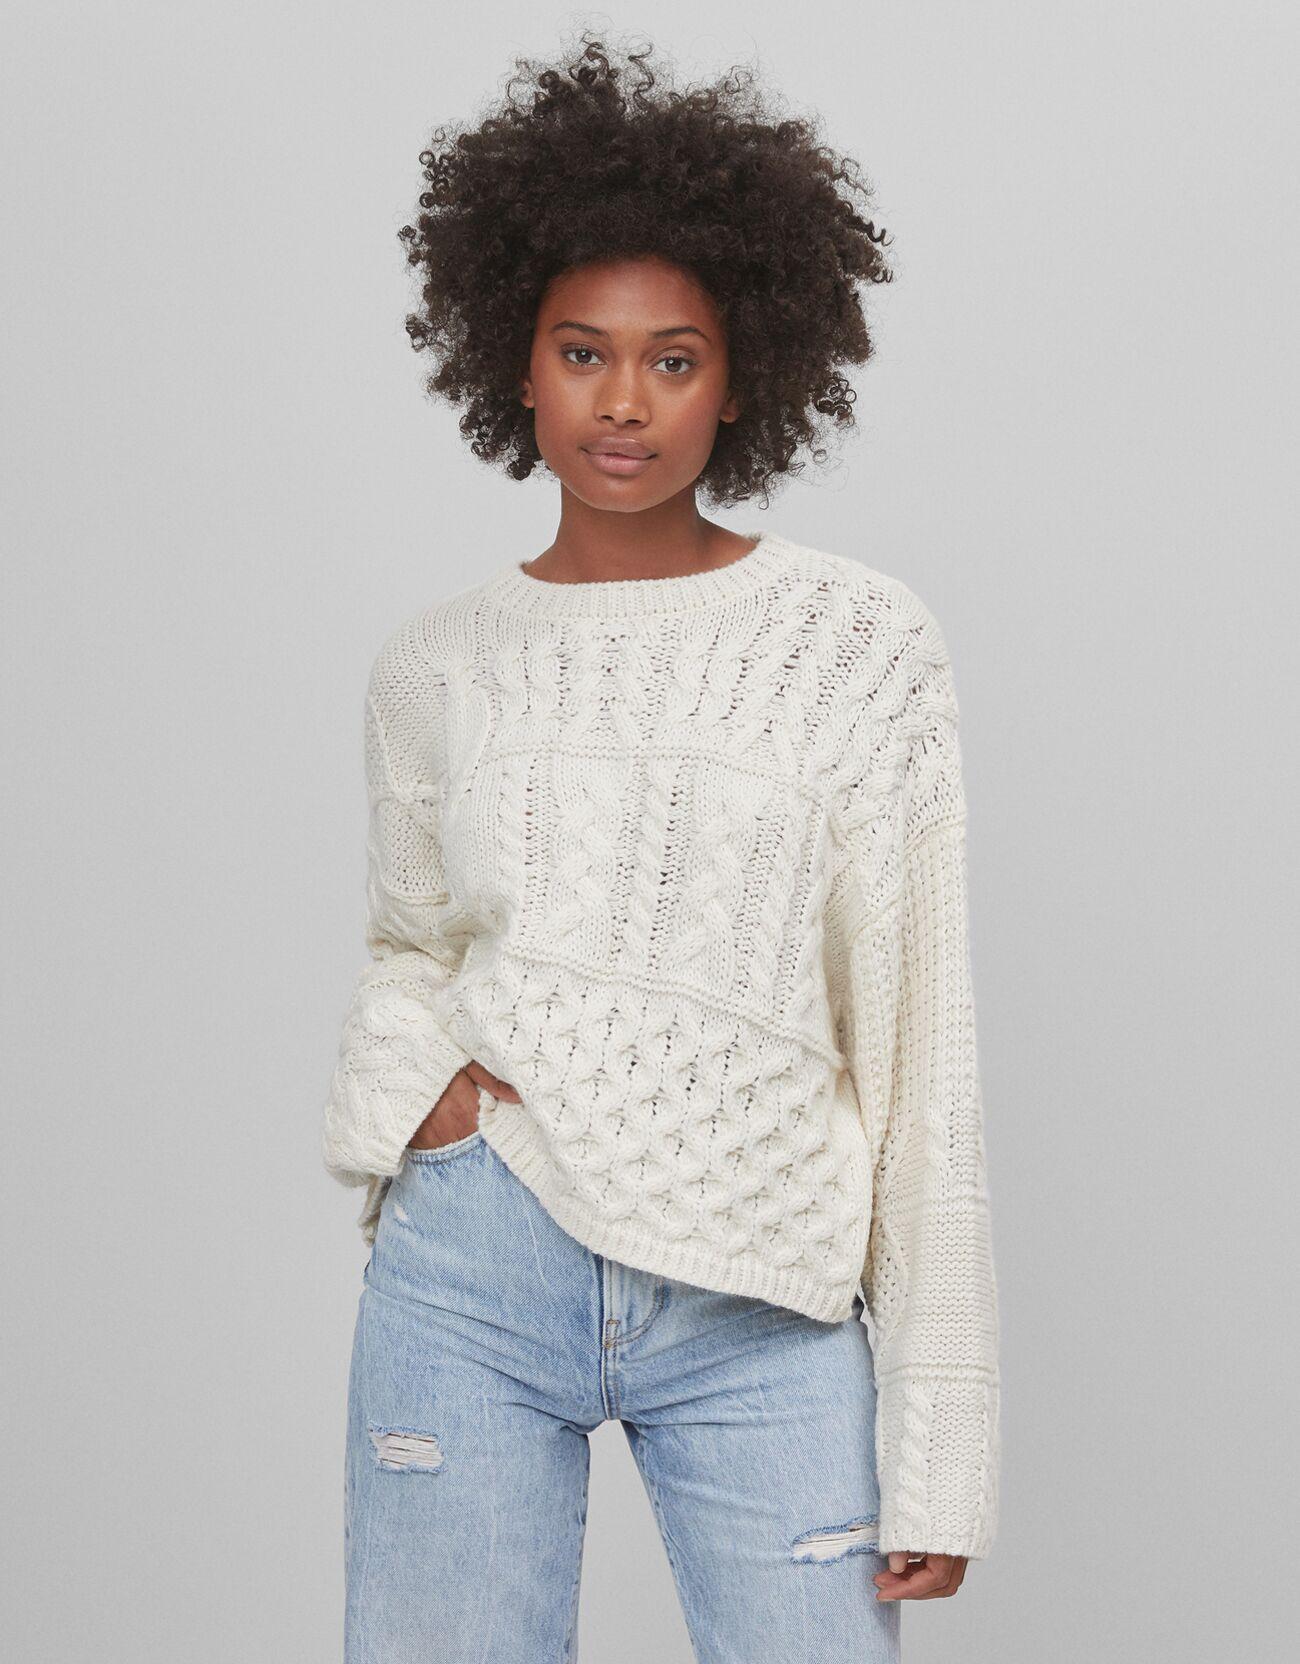 bershka -  Oversized-Pullover Mit Zopfmuster Damen S Rohweiß